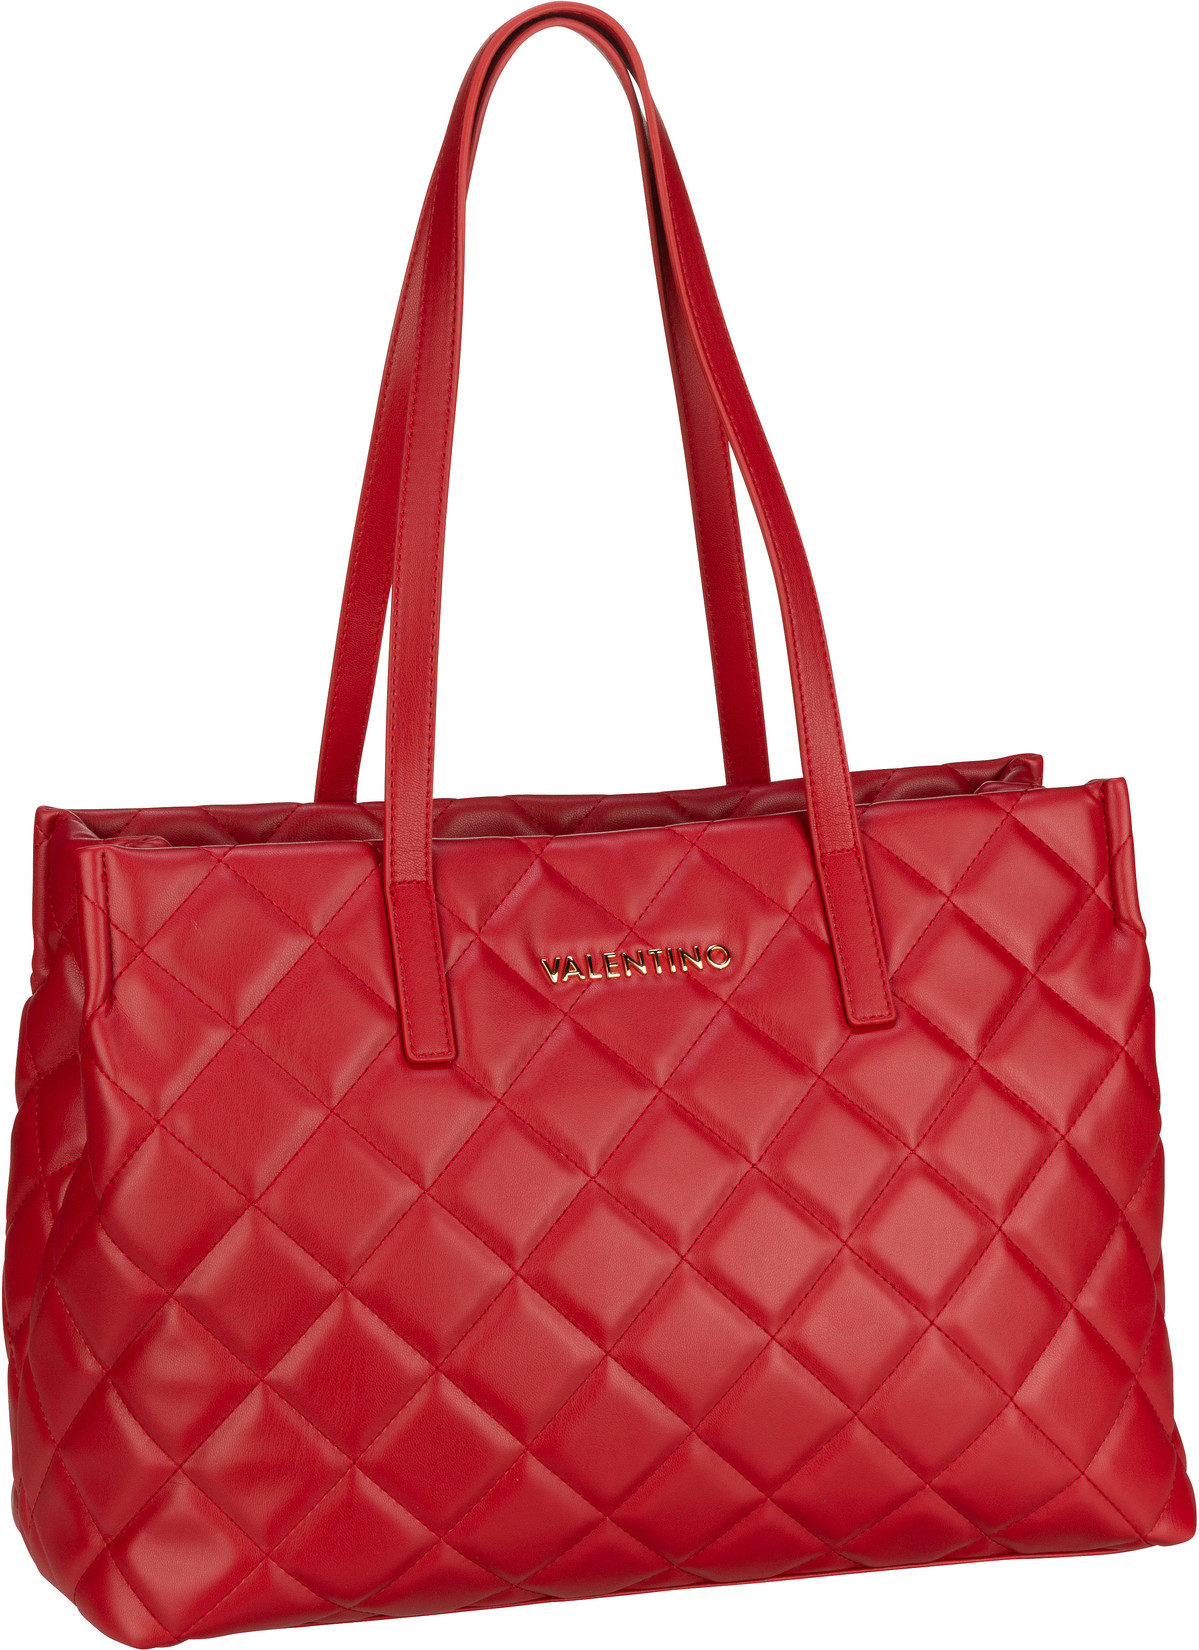 Bags Handtasche Ocarina Shopping K10 Rosso